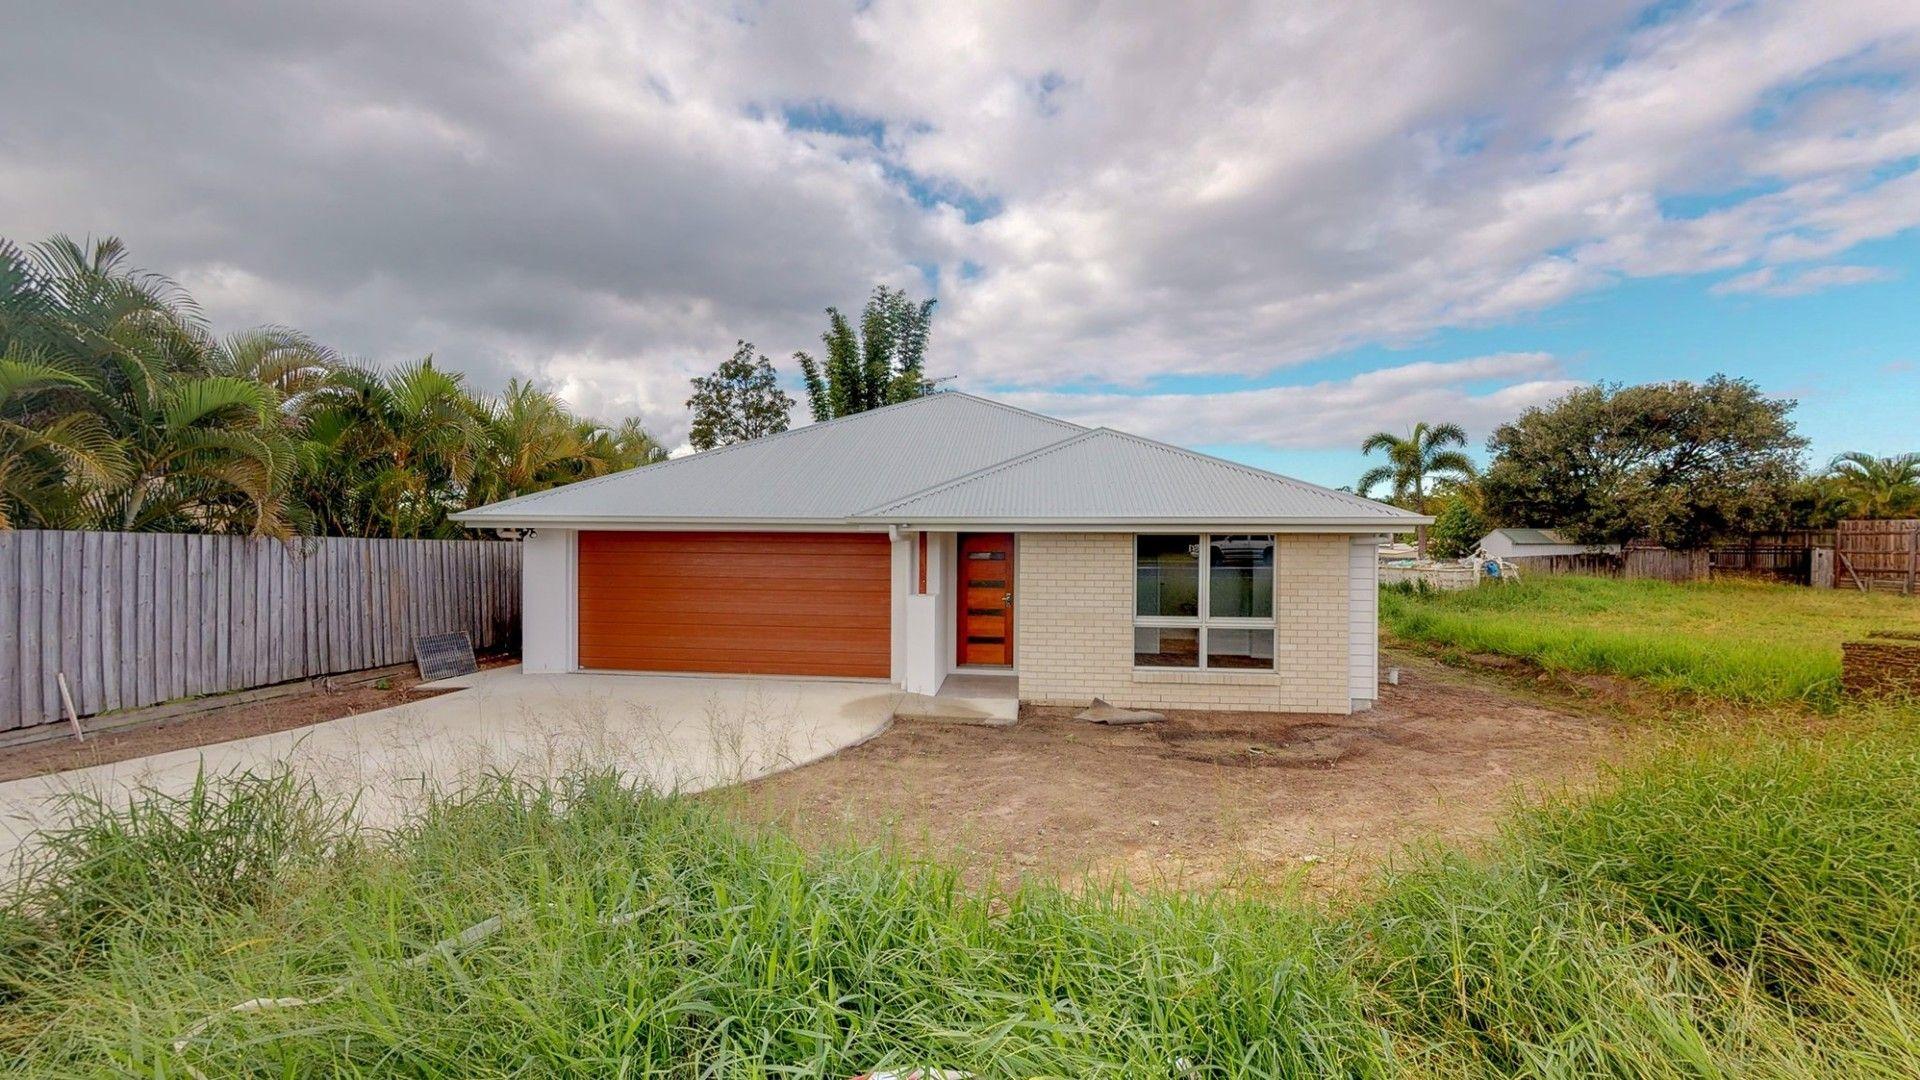 Lot 19 Cambooya Ridge Estate, Cambooya QLD 4358, Image 0